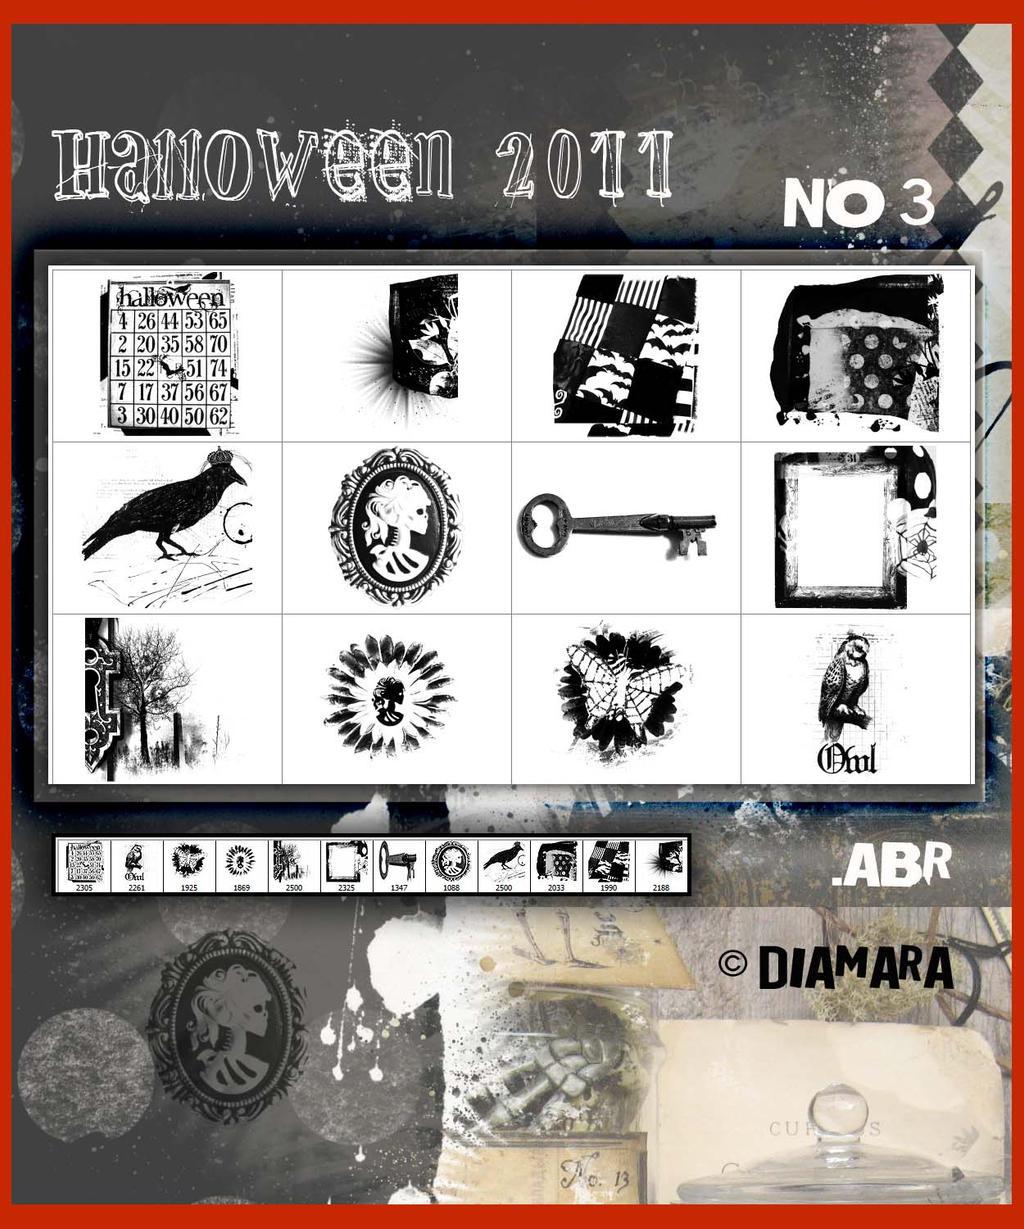 Halloween2011 ArtBrushes by Diamara